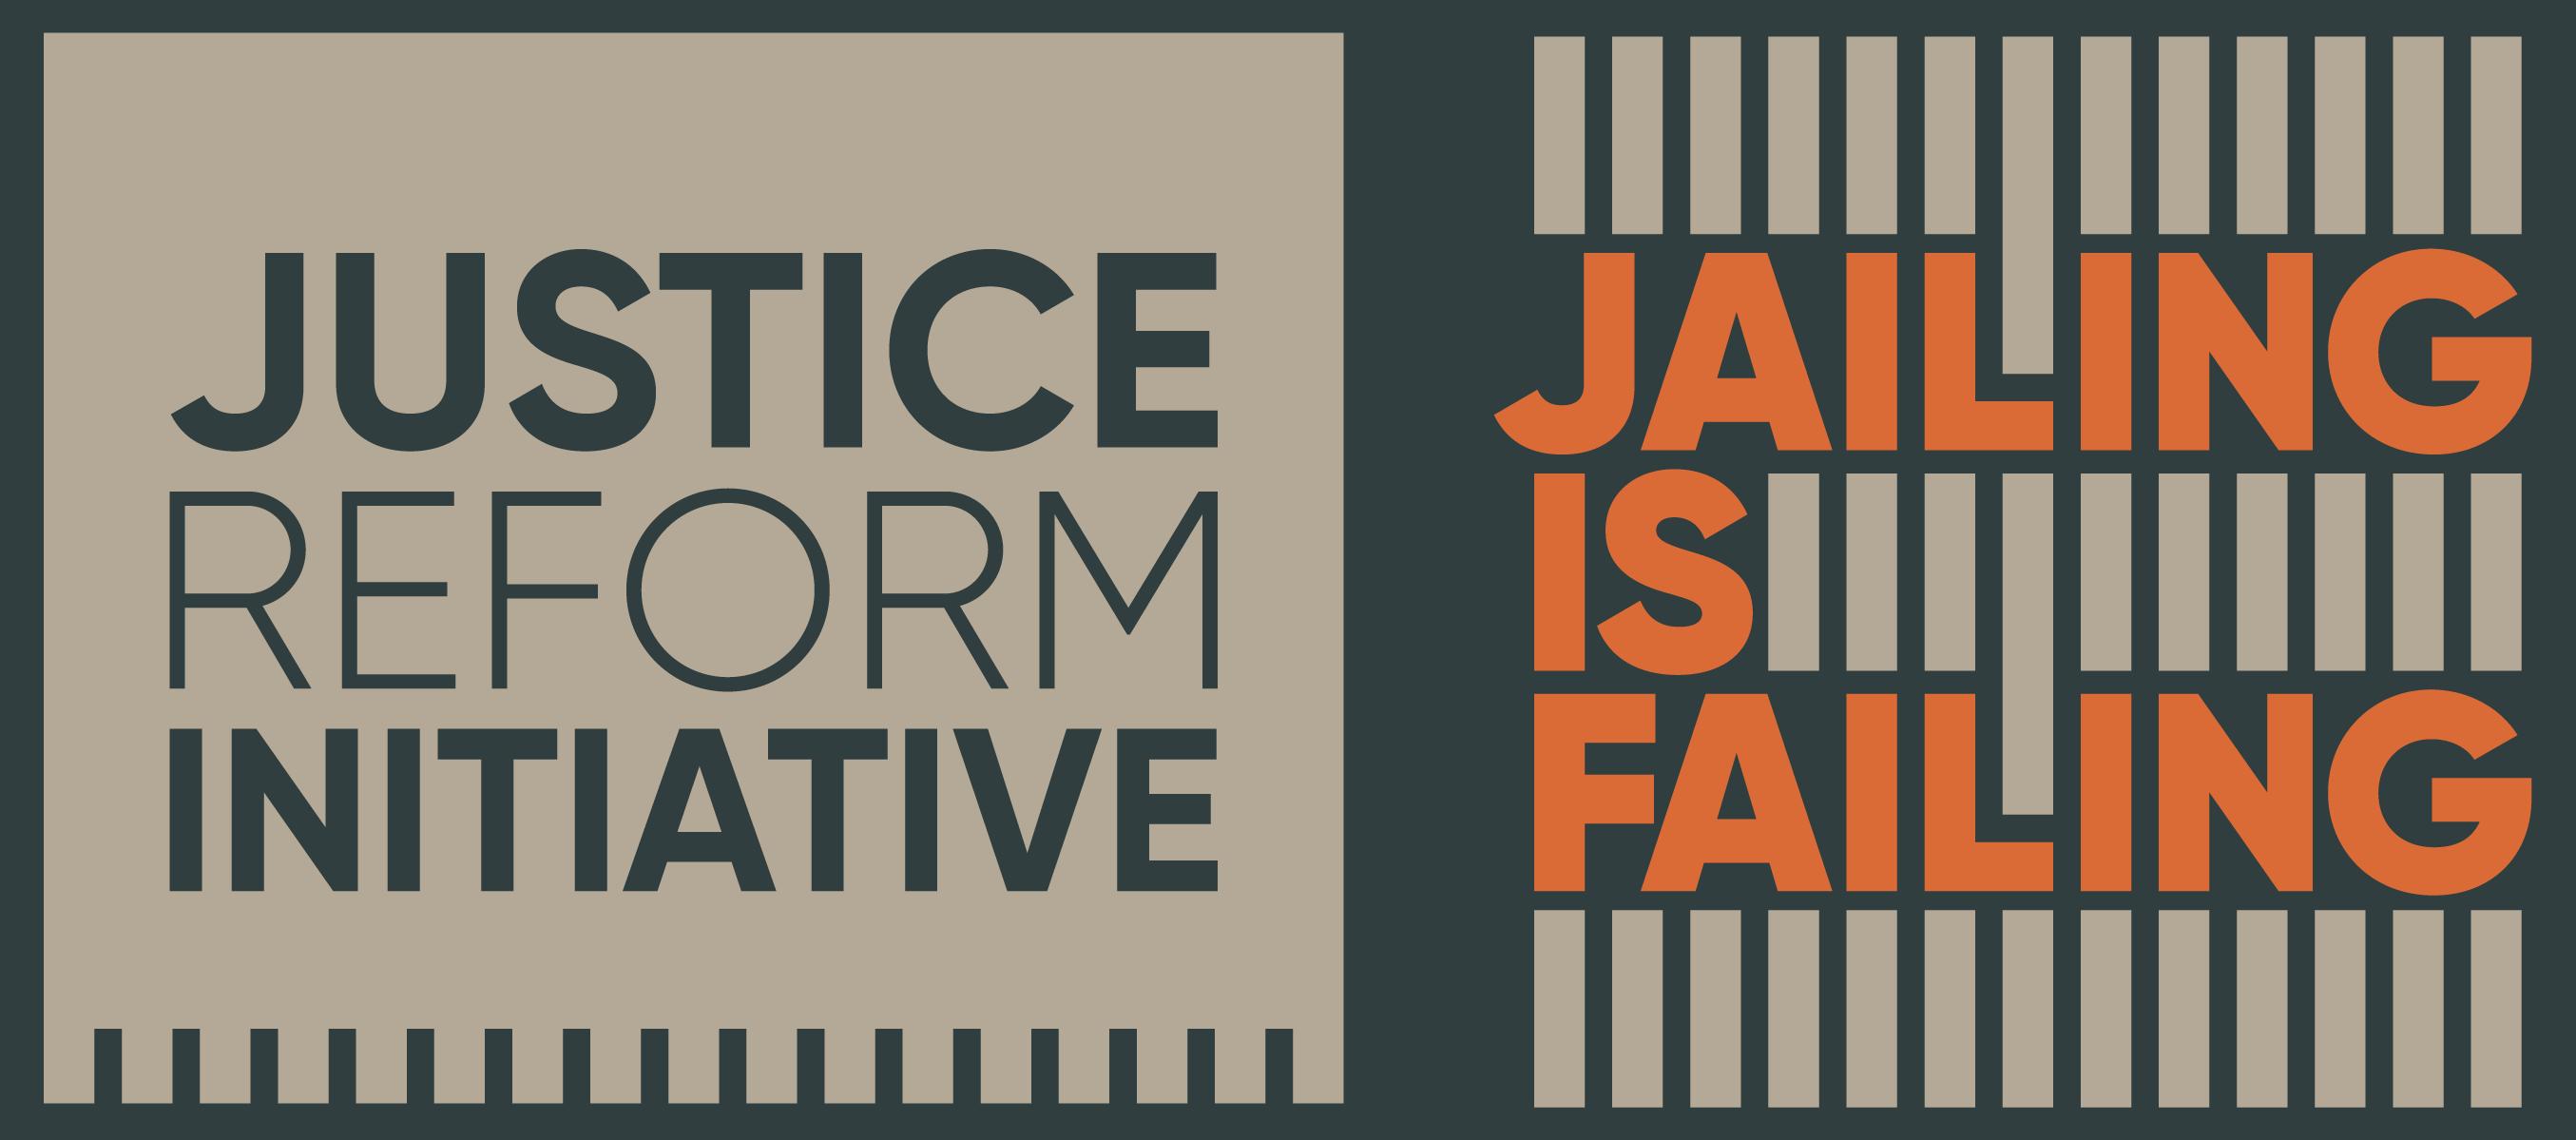 Justice Reform Initiative